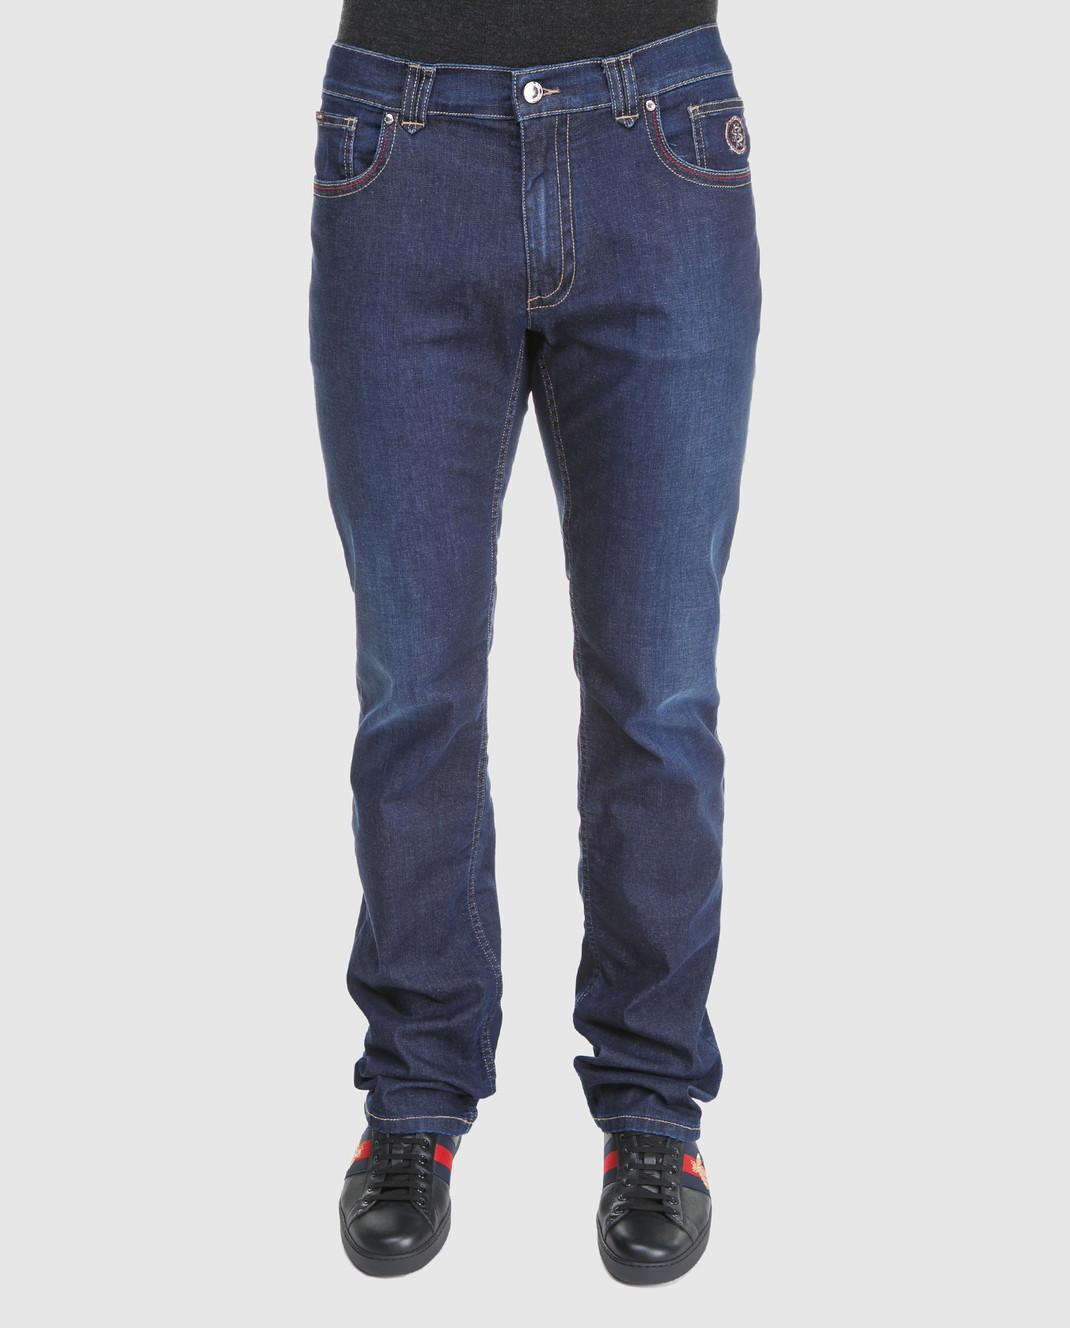 Massimo Sforza Синие джинсы RIVIERAWEBER13 изображение 3